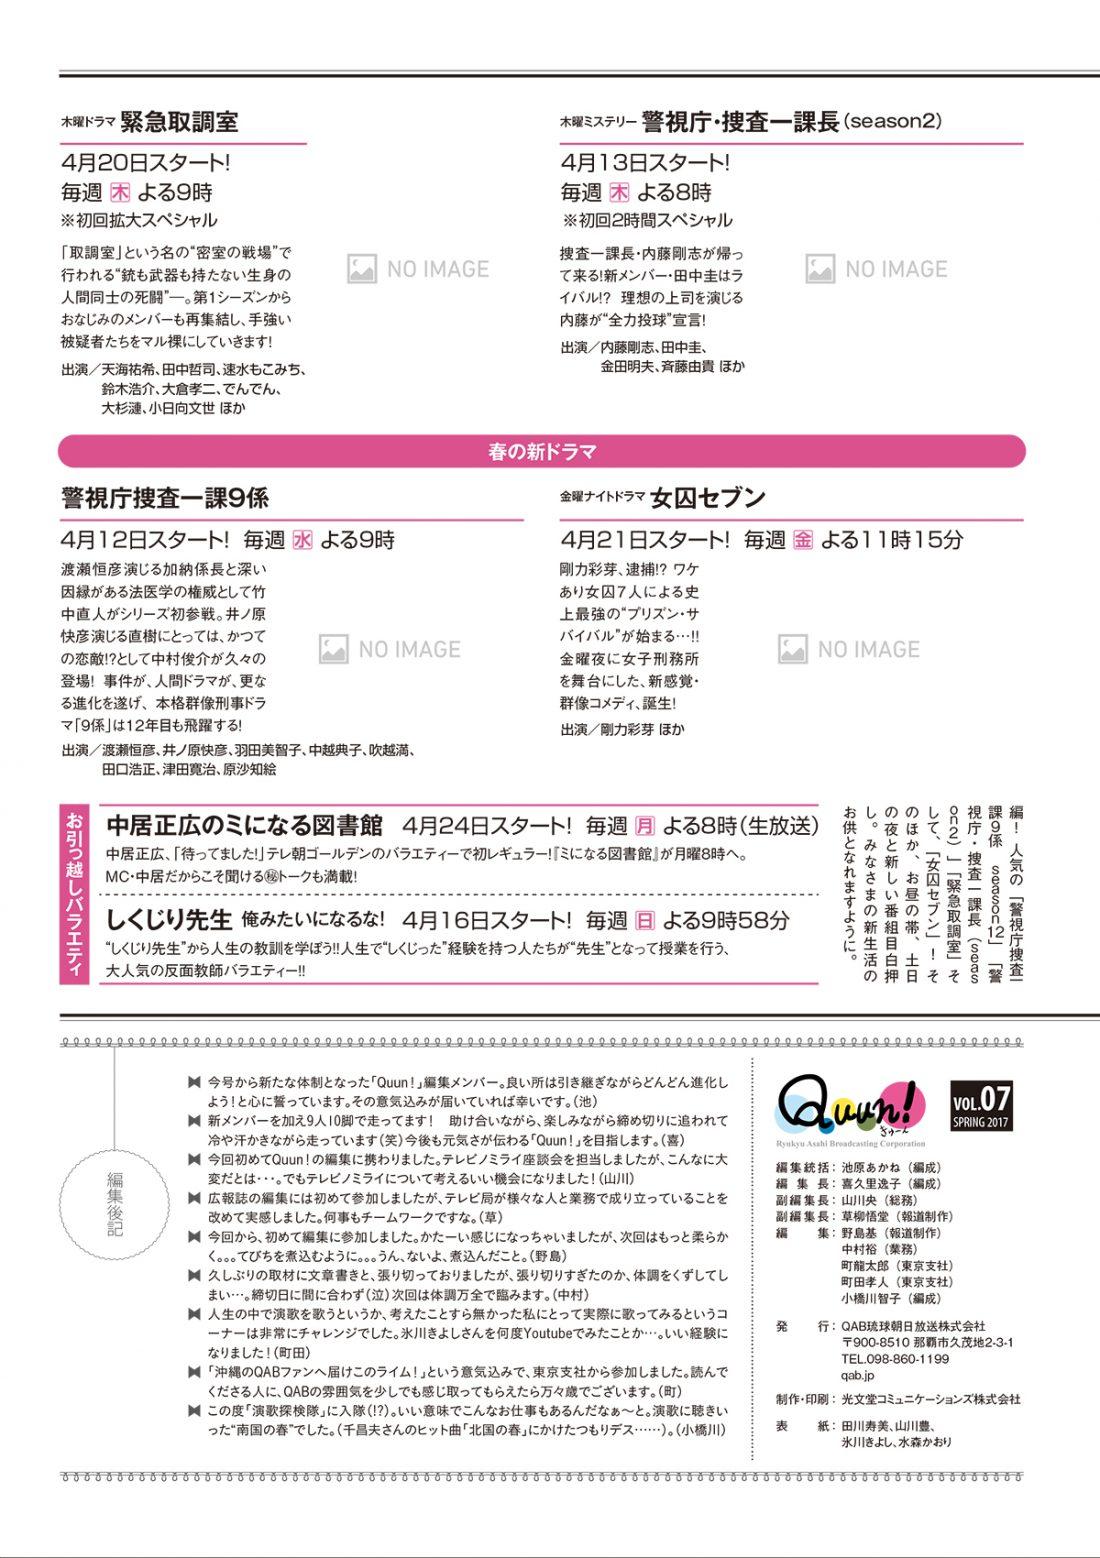 http://www.qab.co.jp/qgoro/wp-content/uploads/quun_0715-1100x1558.jpg